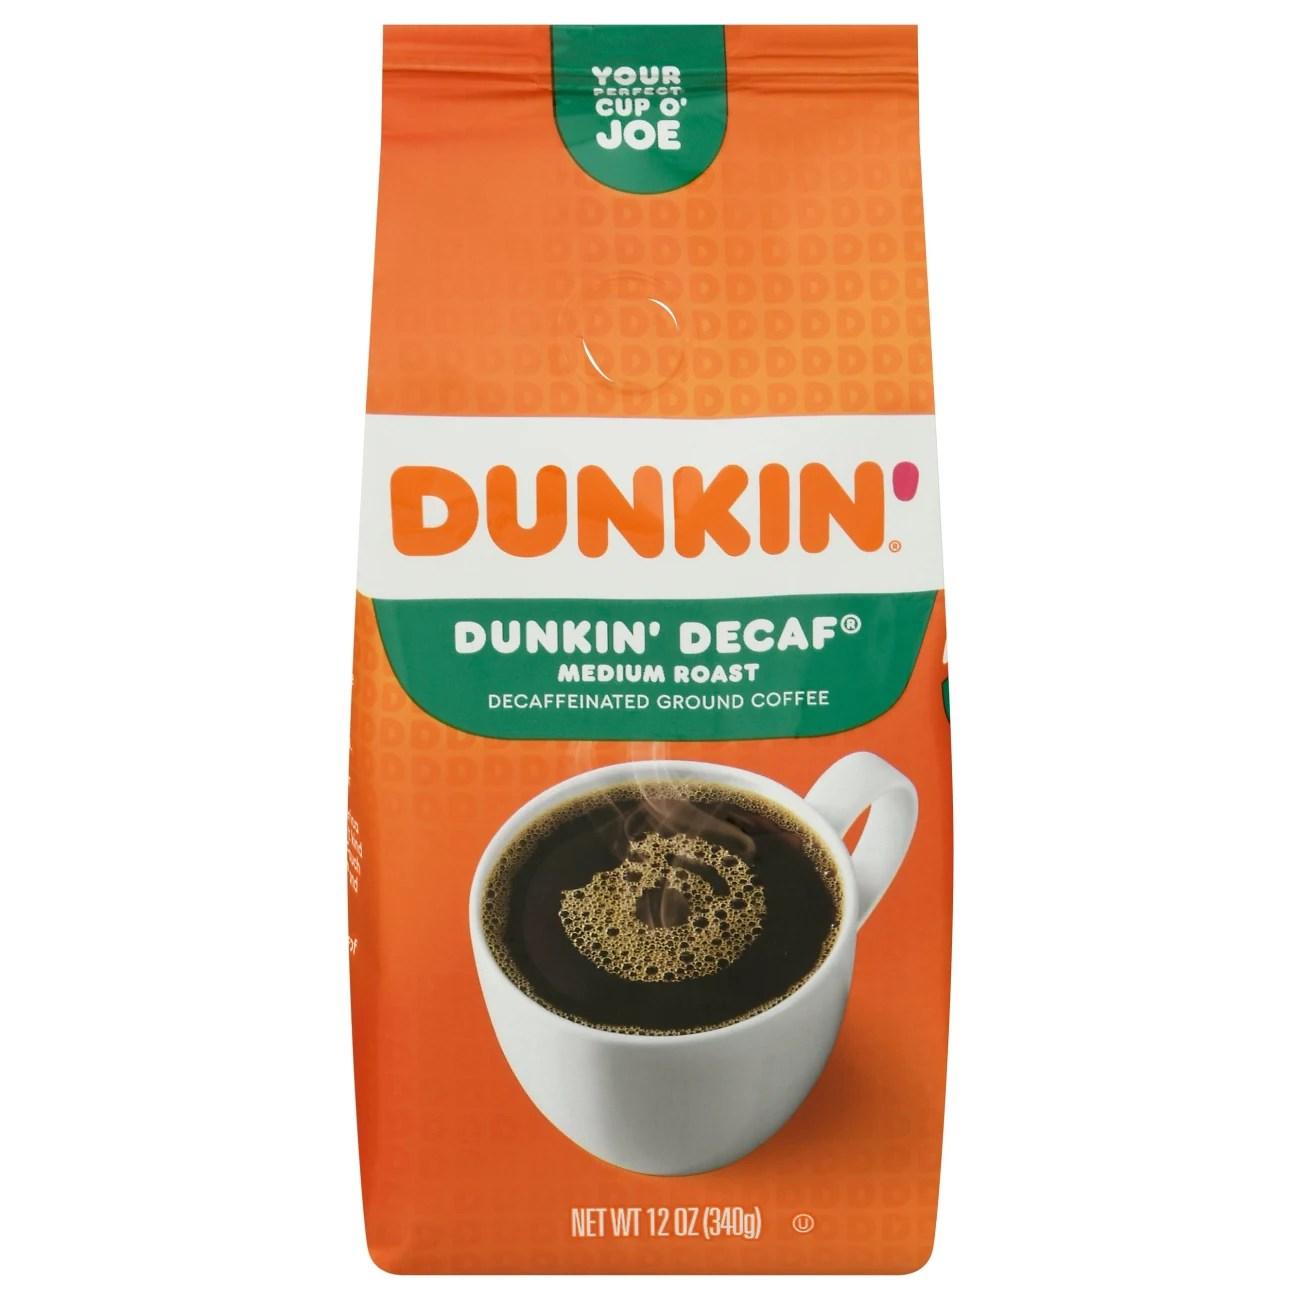 Dunkin' Donuts Dunkin' Decaf Medium Roast Ground Coffee ...